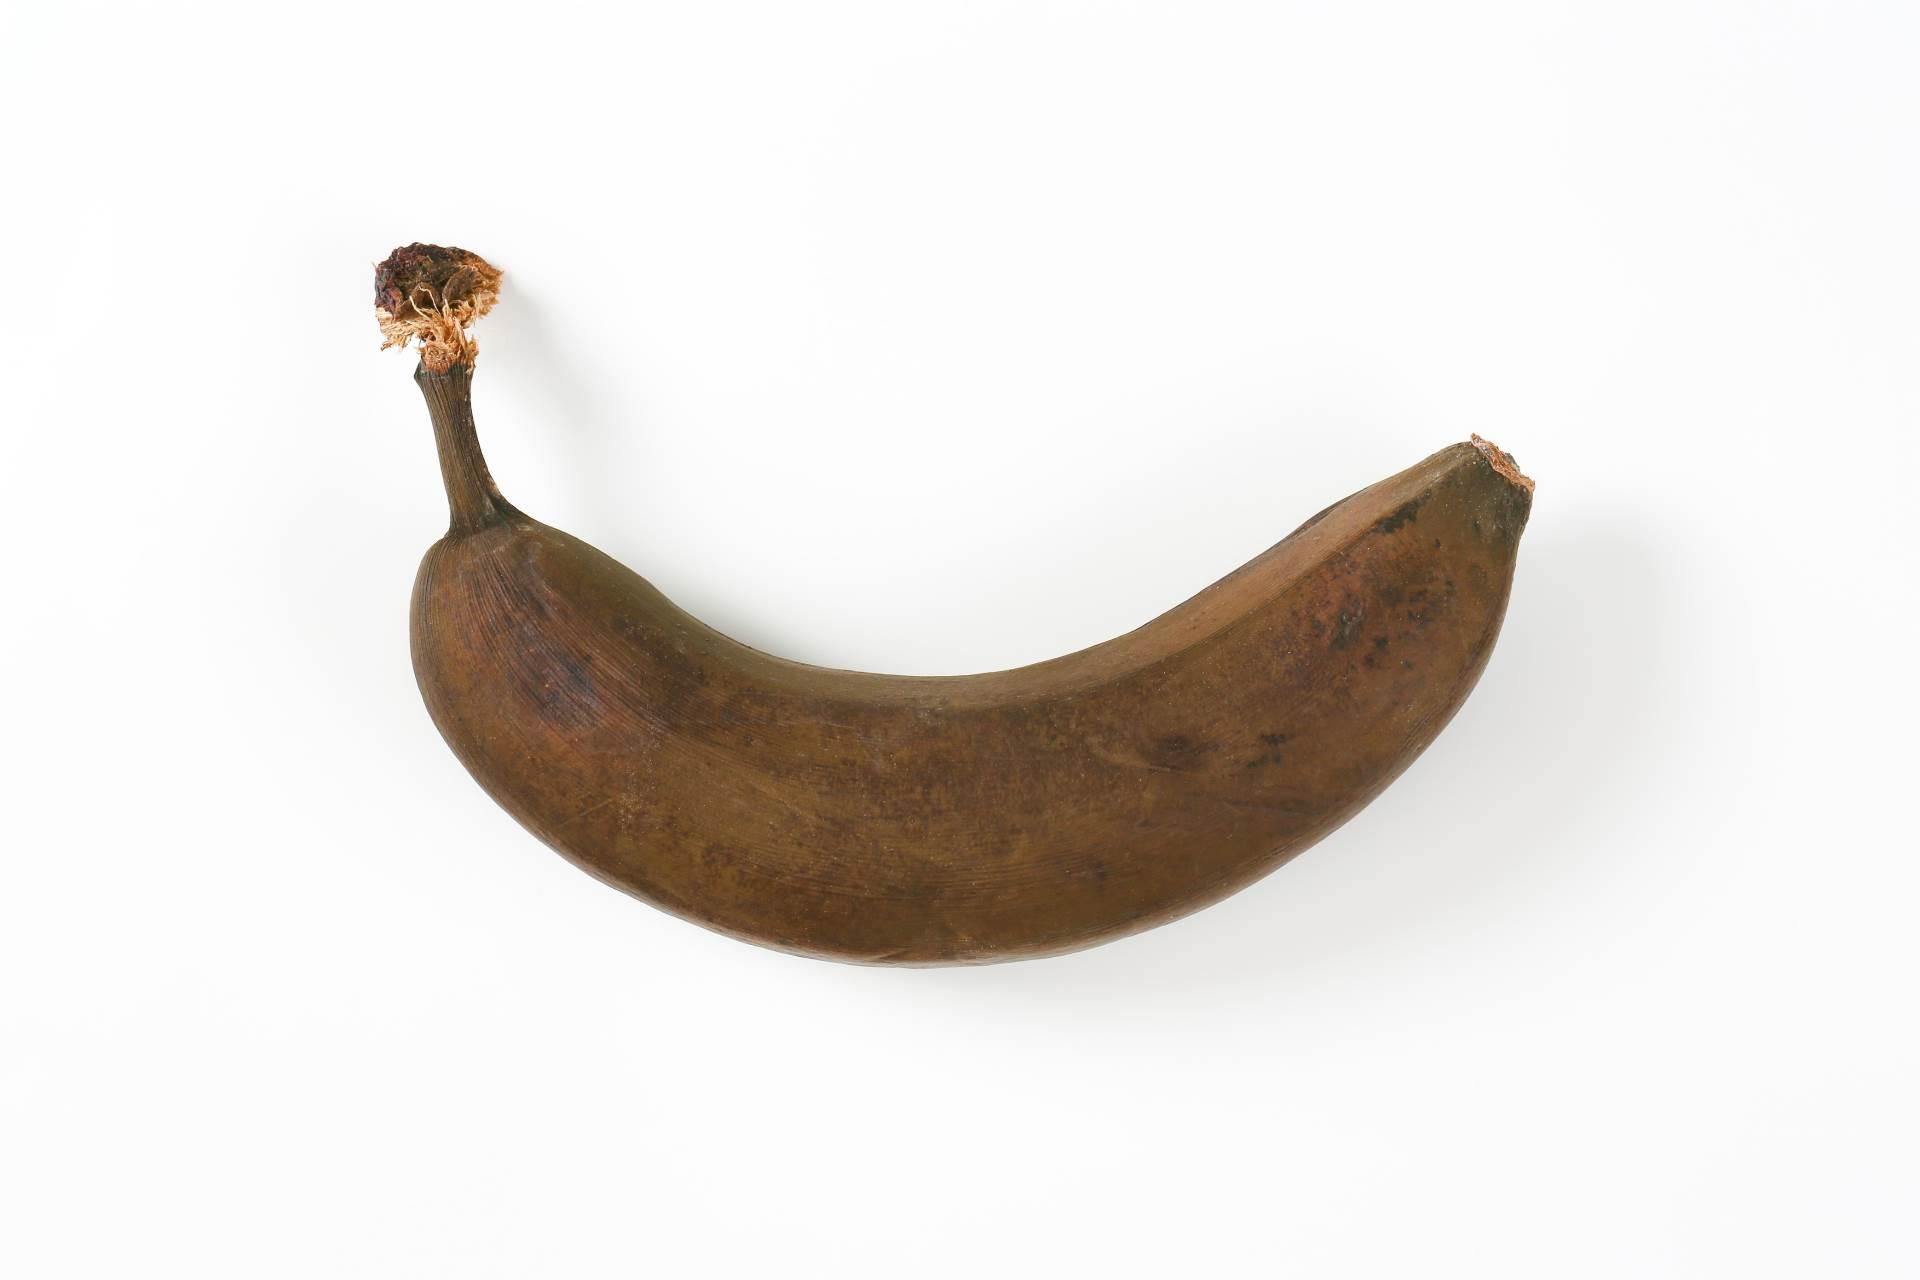 Zrela banana